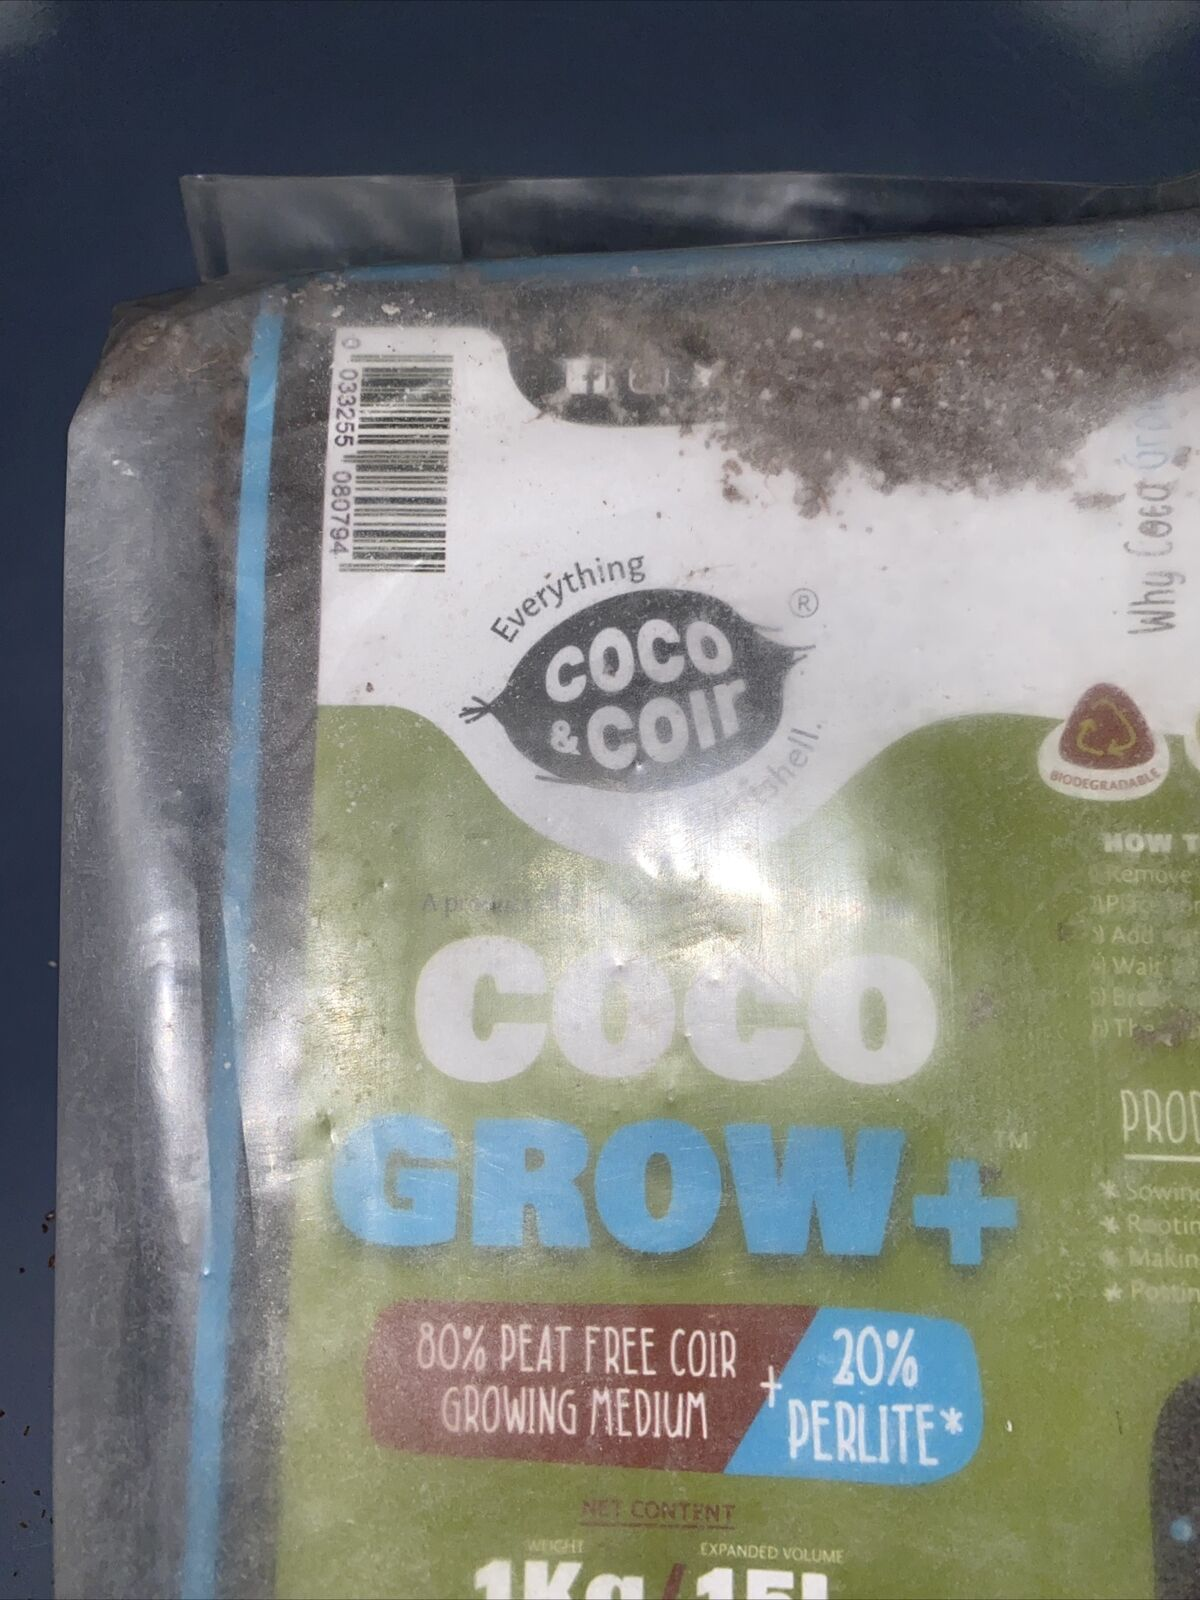 Coco & Coir Coco Grow + 80% Peat Free Coir Growing Medium & 20% Perlite Compost